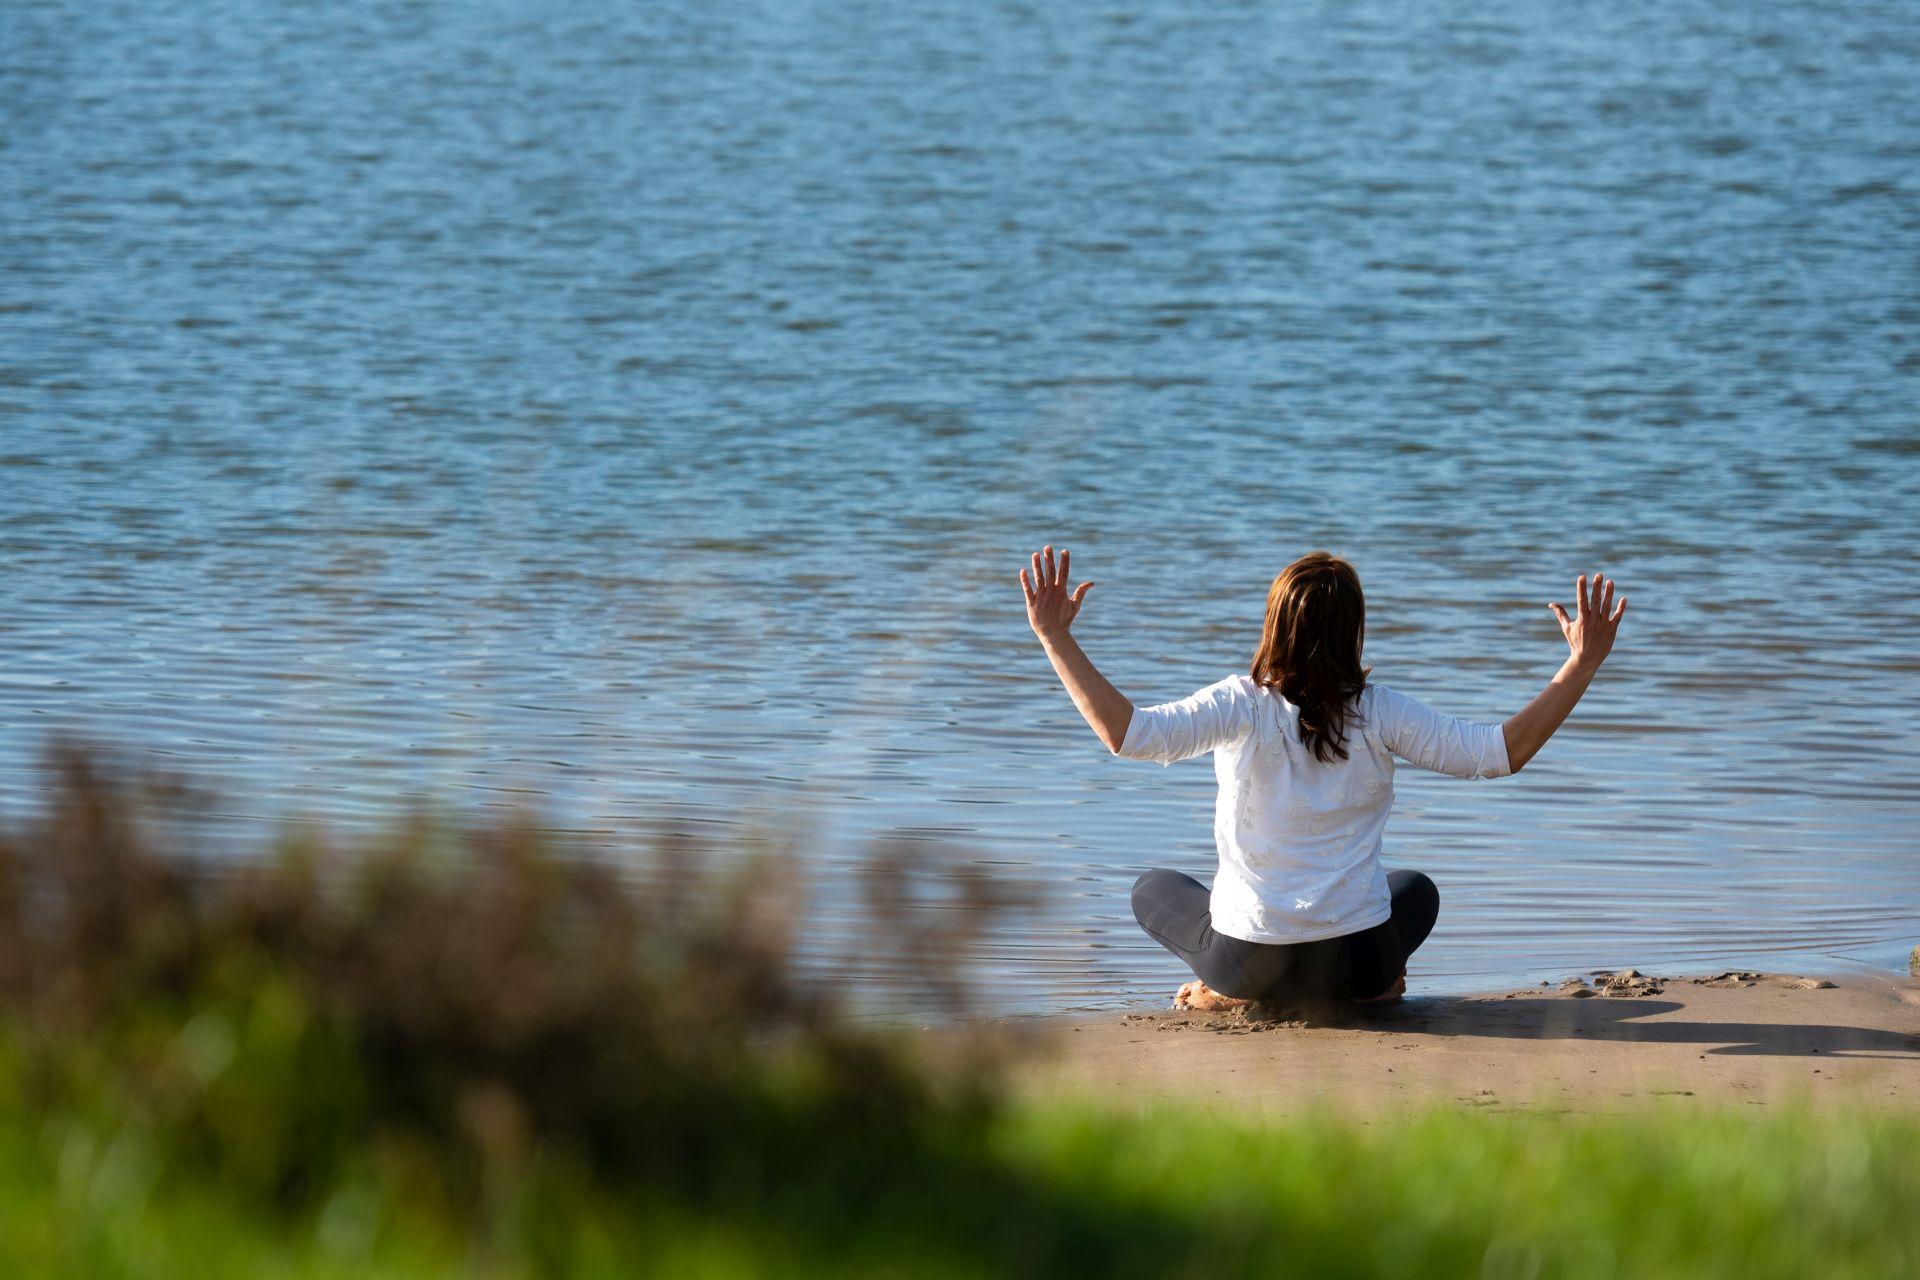 yoga_voor_roeiers - Leefstijlcoach-Wageningen-Ede-Bennekom-yoga-coaching-personal-training_DSC_1463